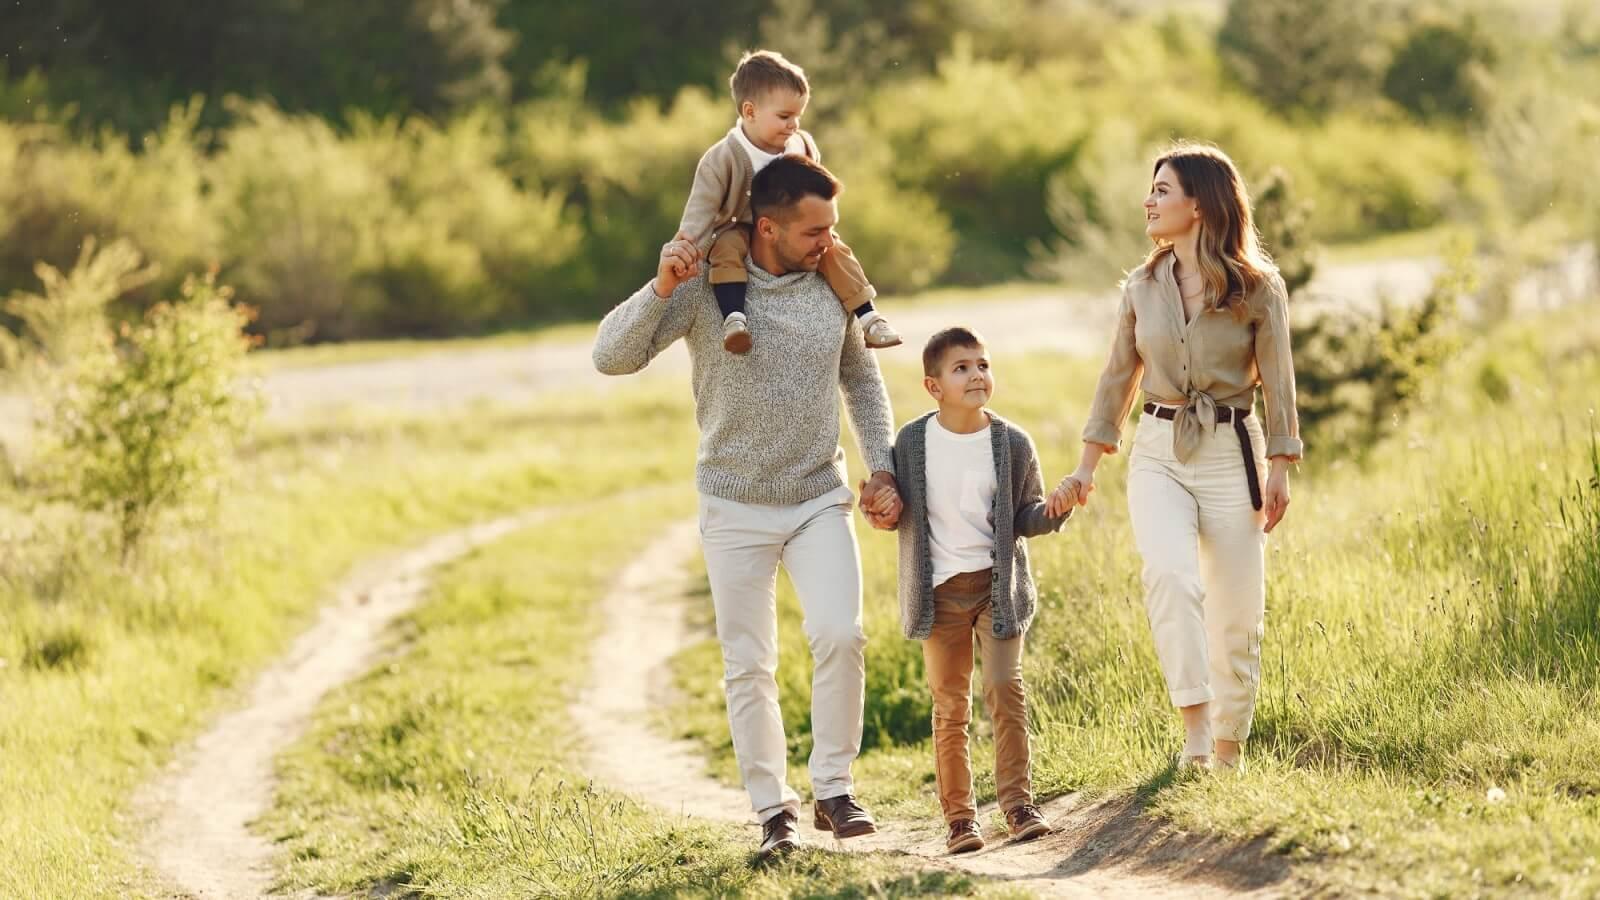 family-walking-outside